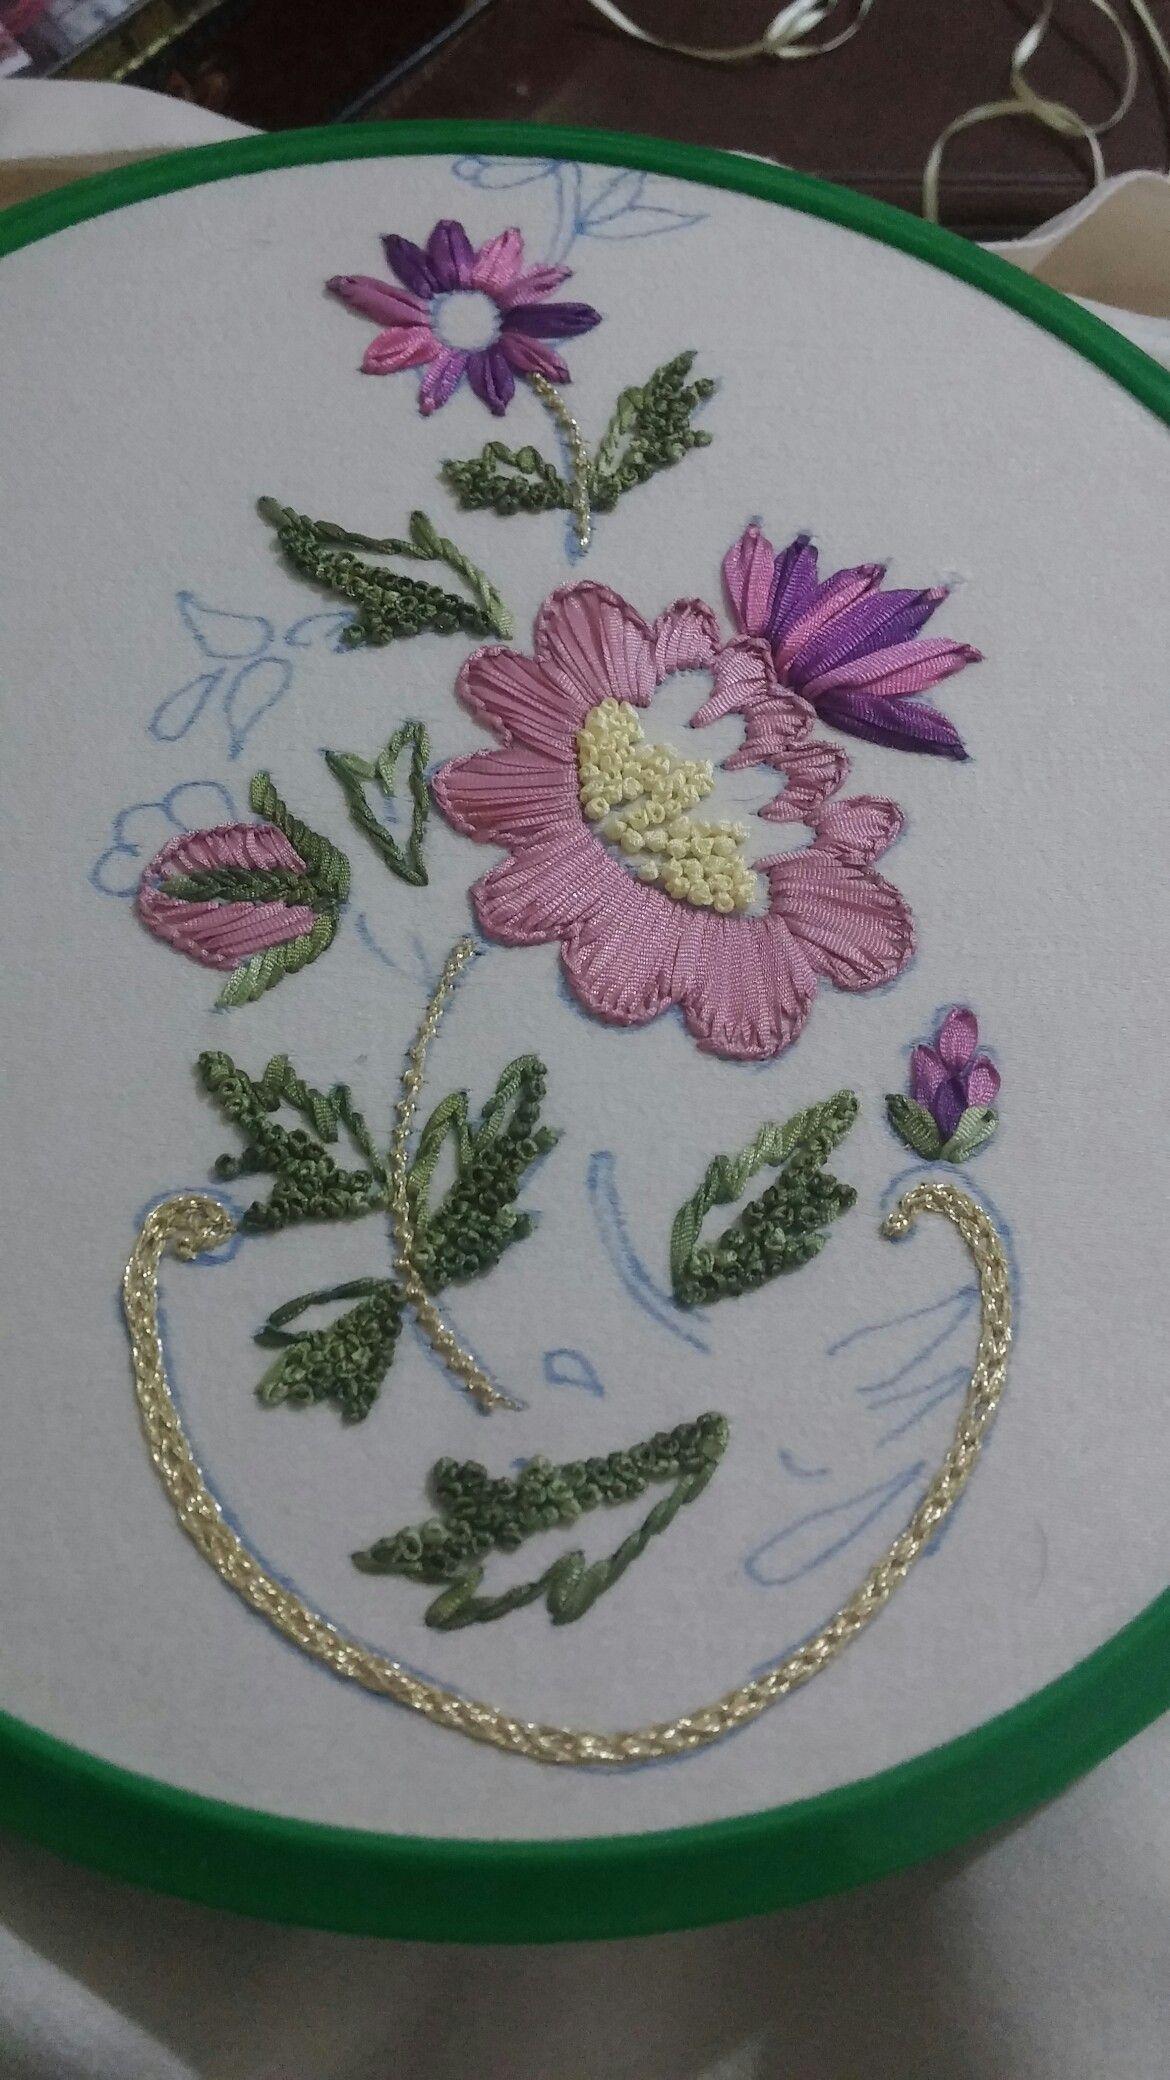 Pin de Rosa Silvia Pave en Bordado   Pinterest   Bordado, Puntadas y ...